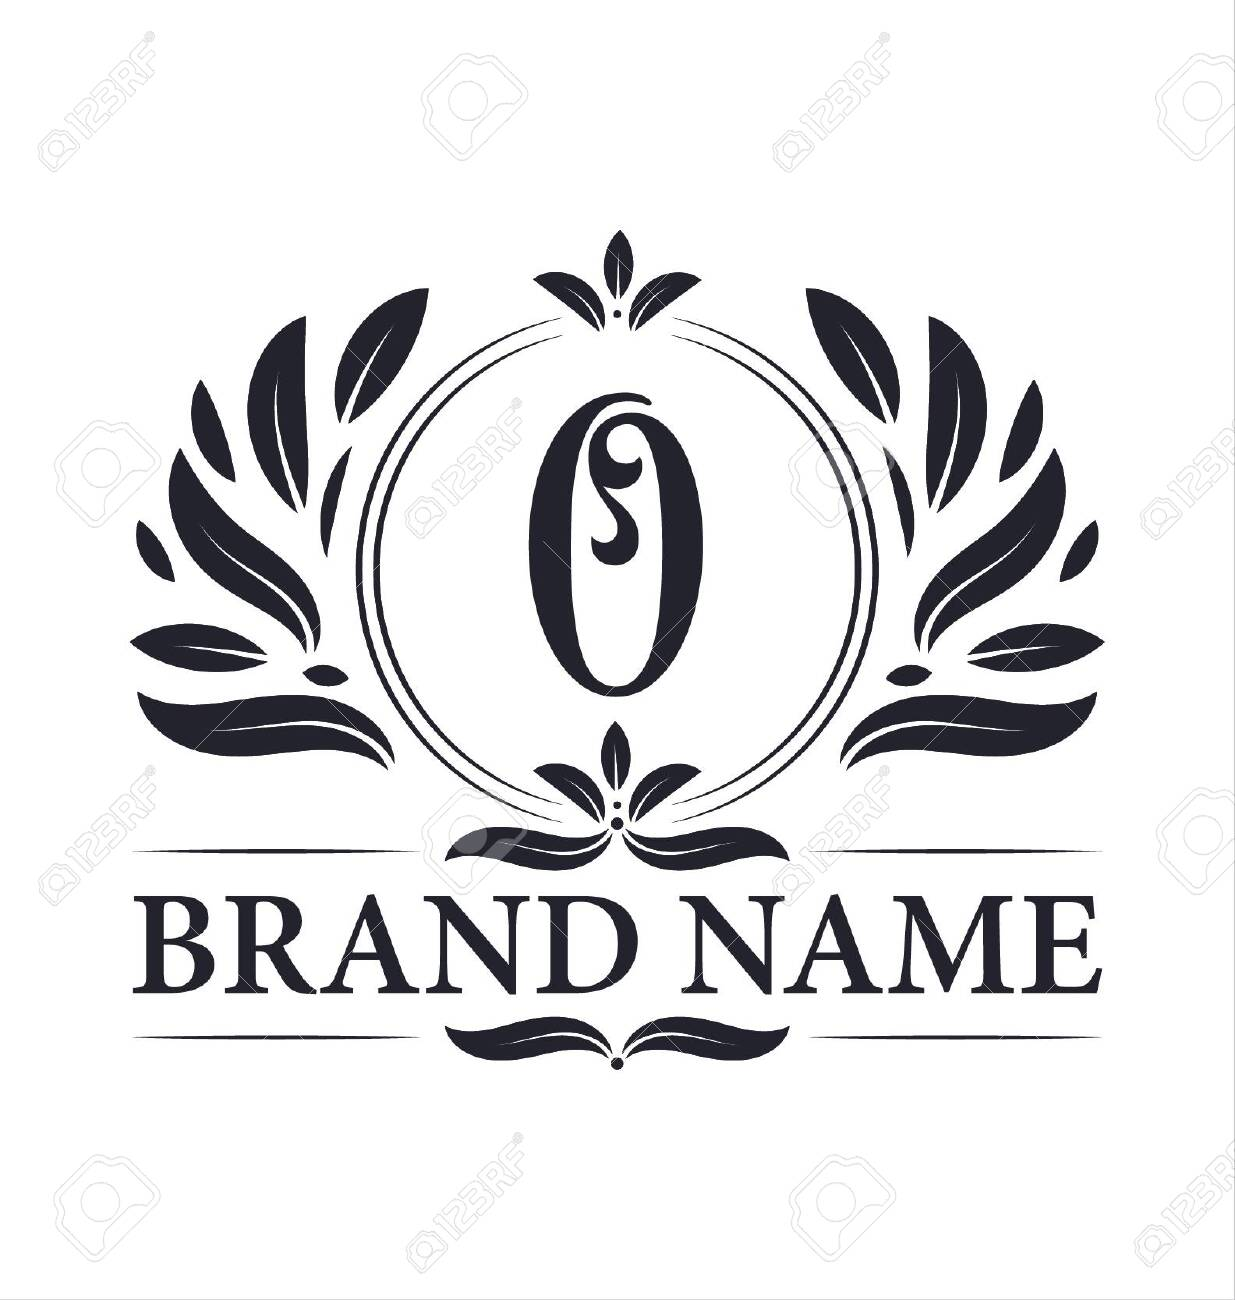 Luxury logo design Letter O logo. Vintage elegant ornamental alphabet O letter logo design. - 141058808